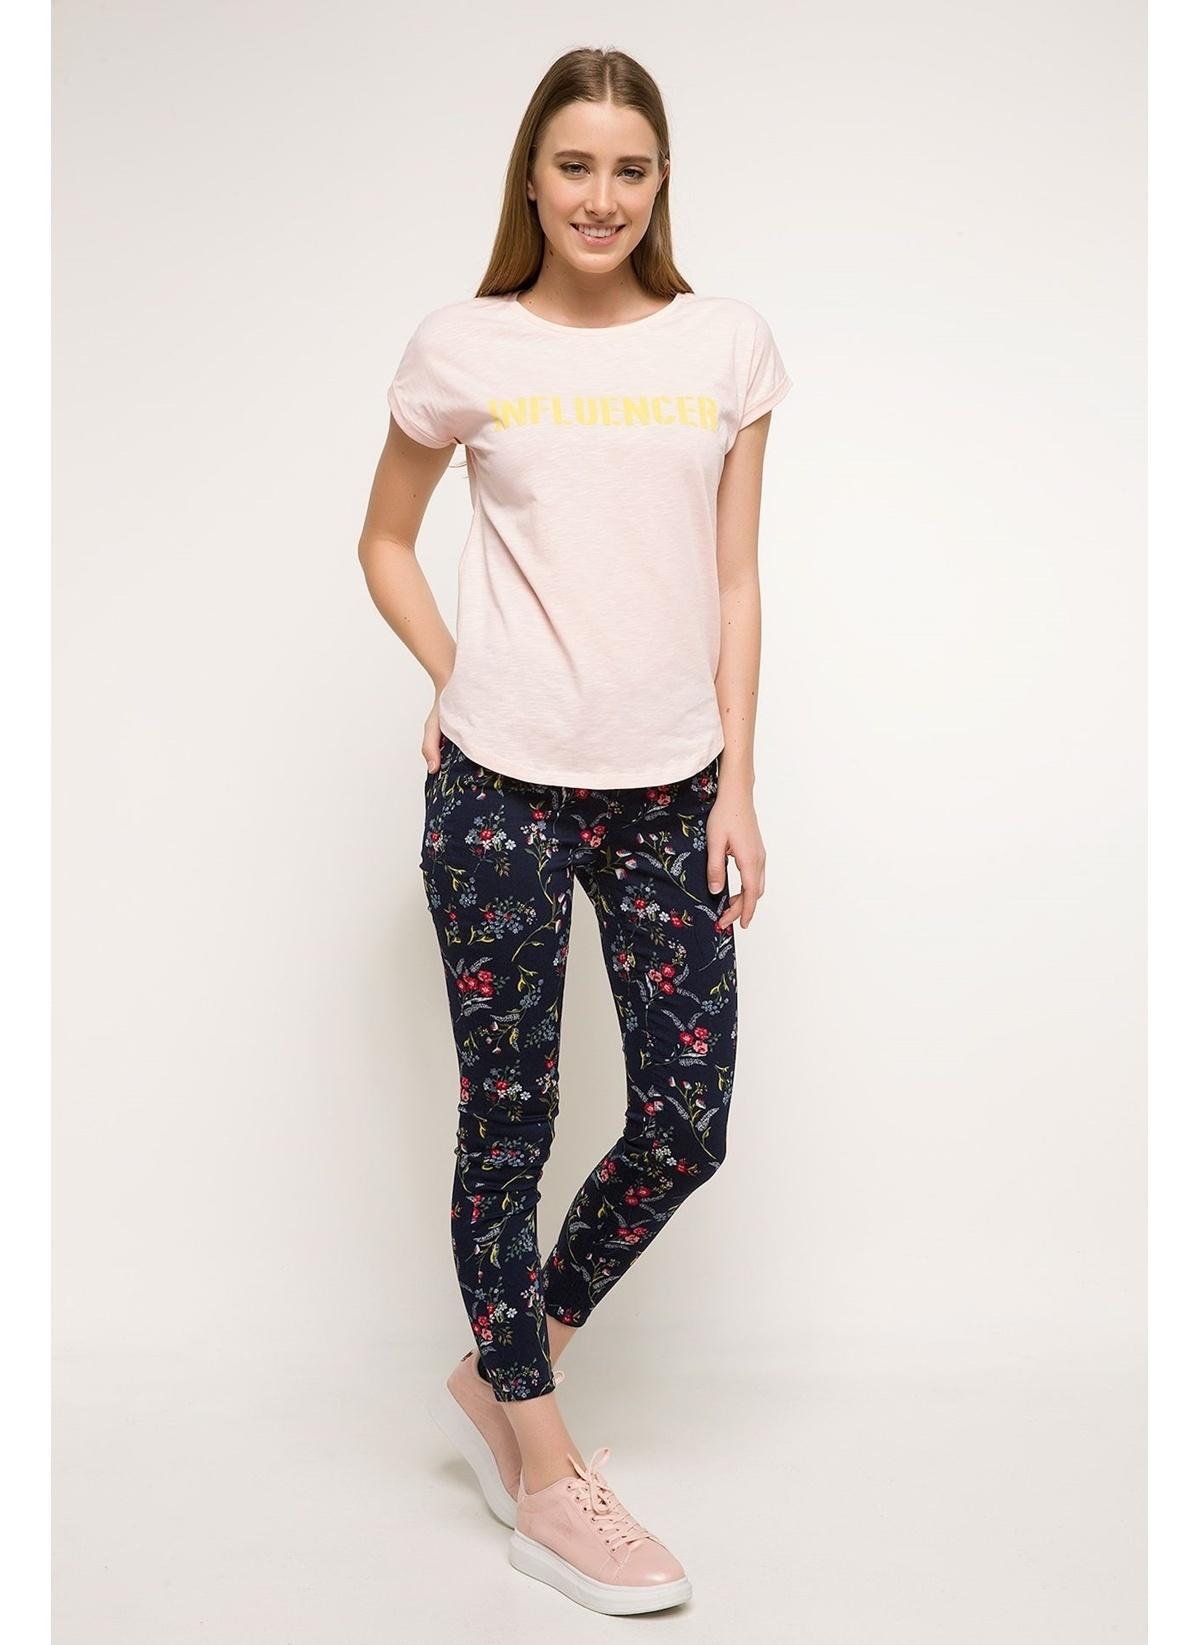 Defacto Anna Yüksek Bel Süper Skinny Desenli Pantolon I5007az18spnv82pantolon – 59.99 TL